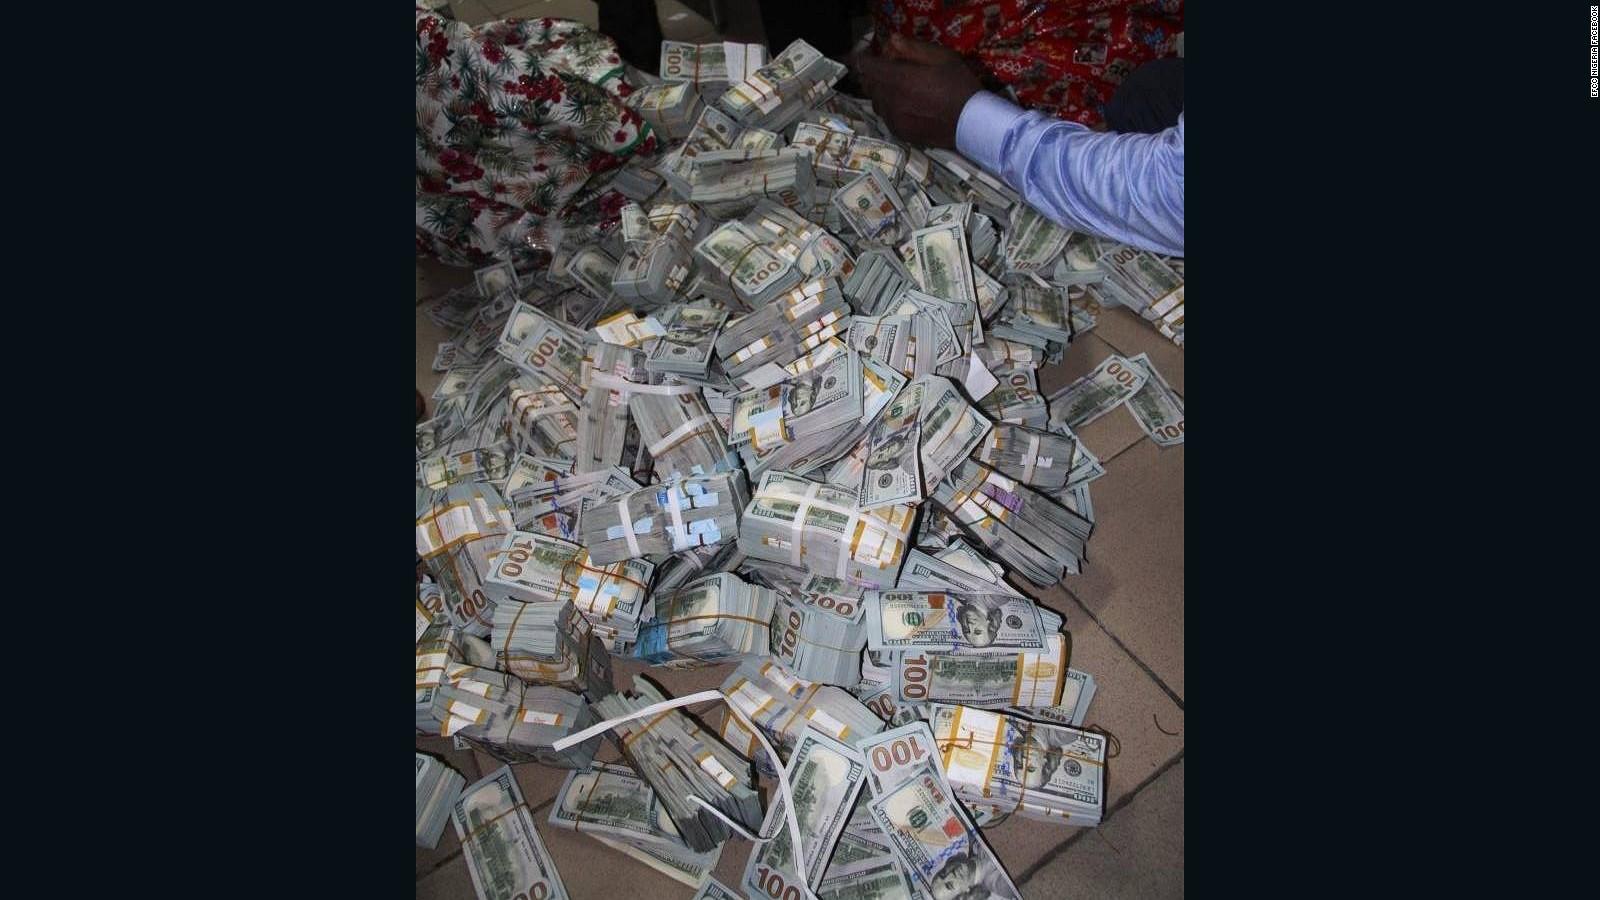 Nigerian Anti Corruption Unit Finds 43 Million In Cash Lagos Apartment Cnn